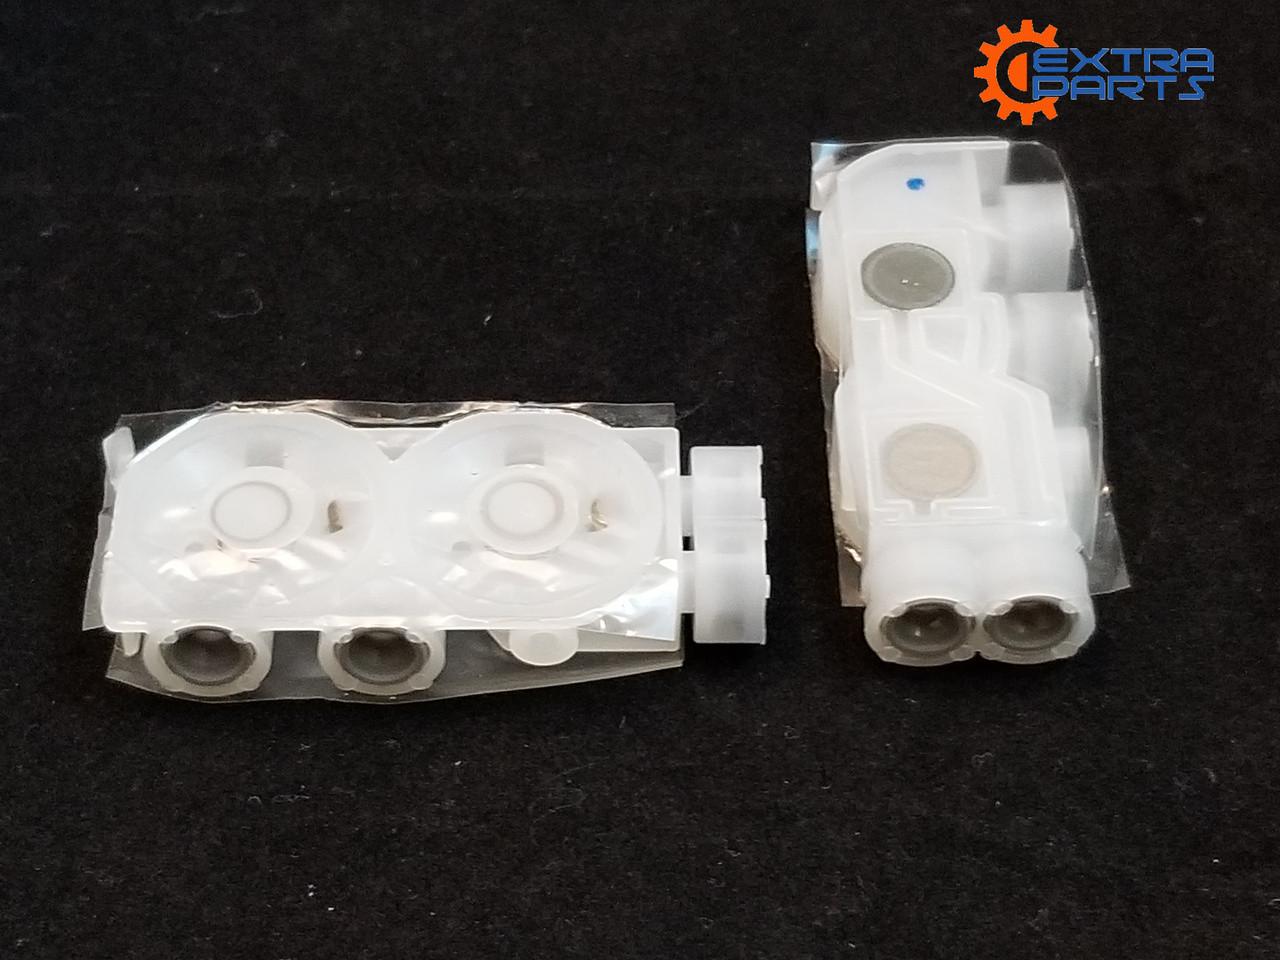 Damper for Epson Stylus Pro 3890 Pro 3880 Pro 3885 160715600 DX6